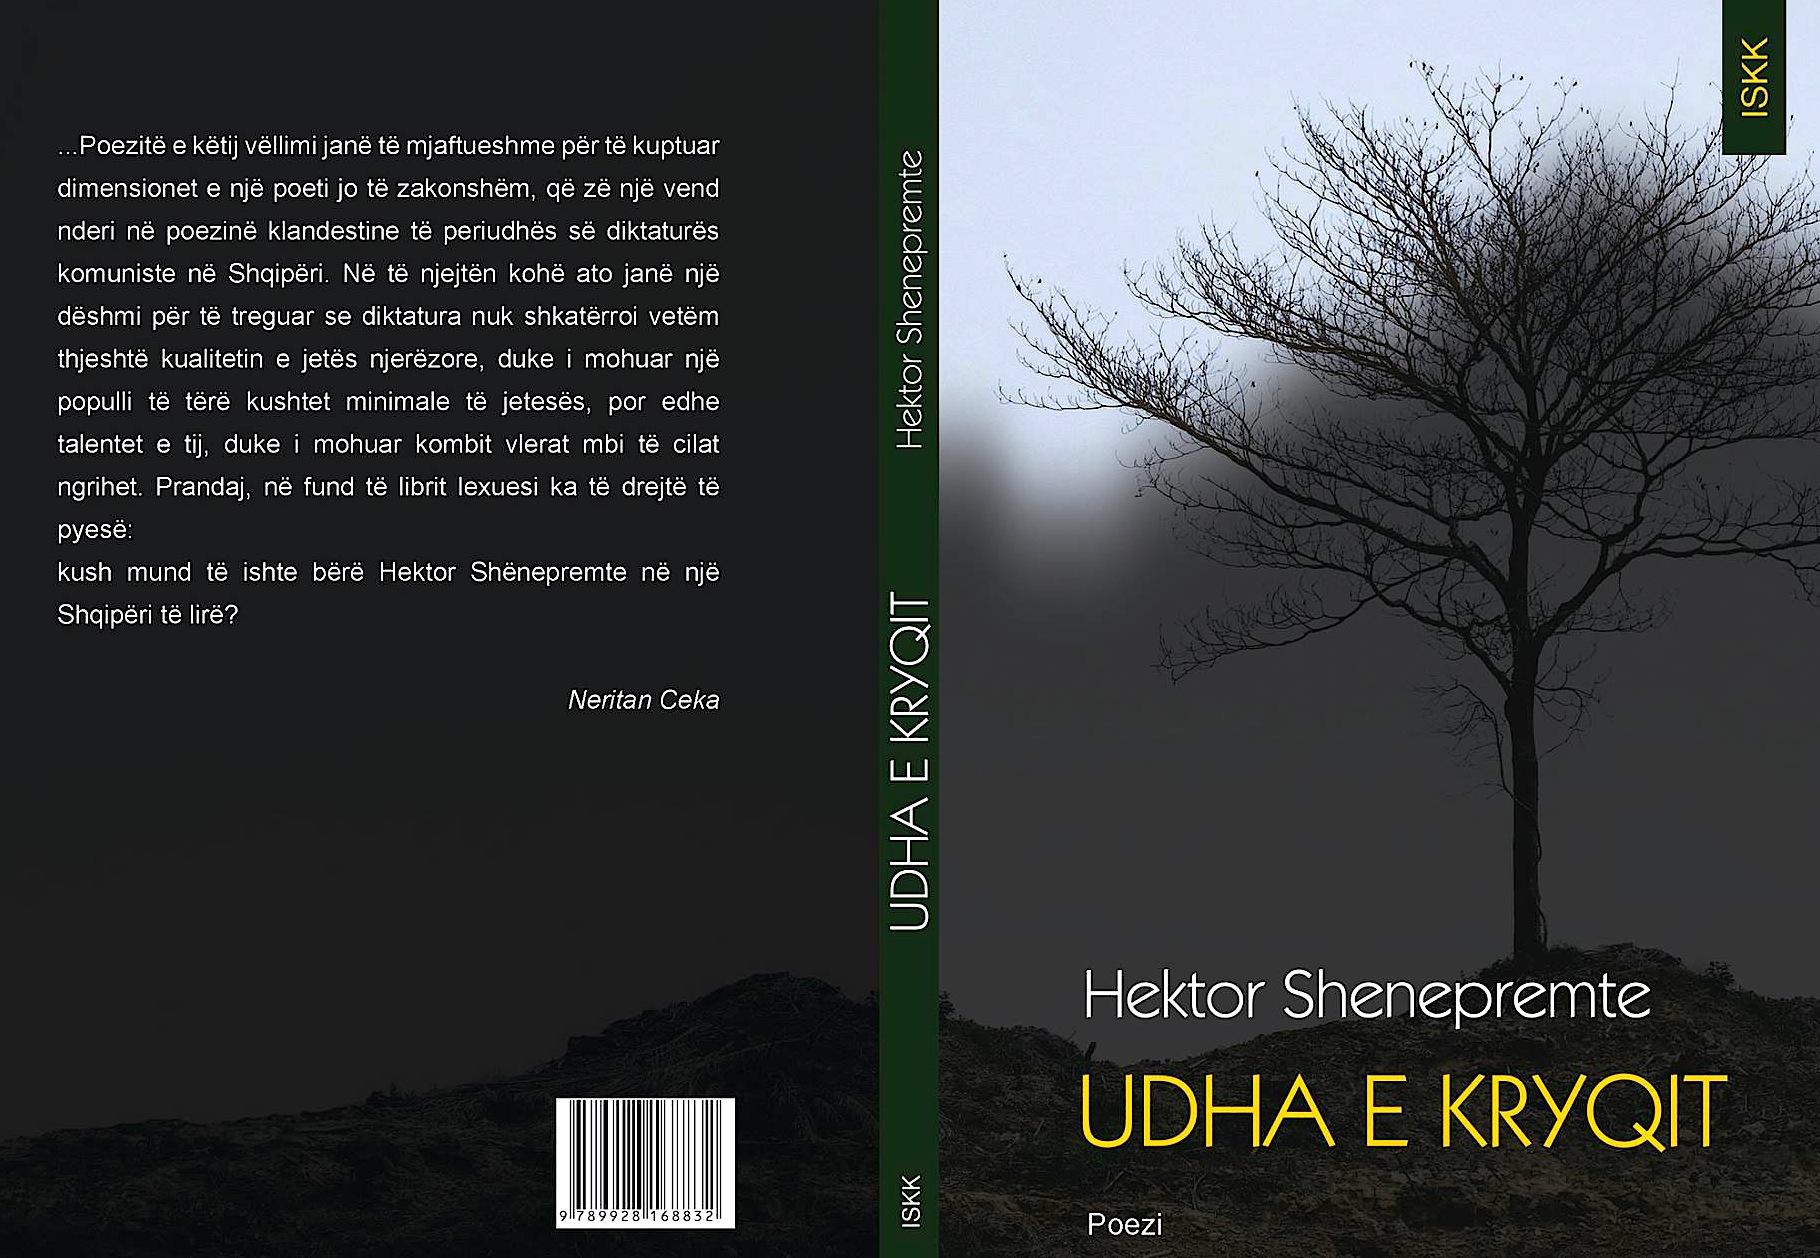 ISKK - Hektor Shenepremte - Koha e Kryqit